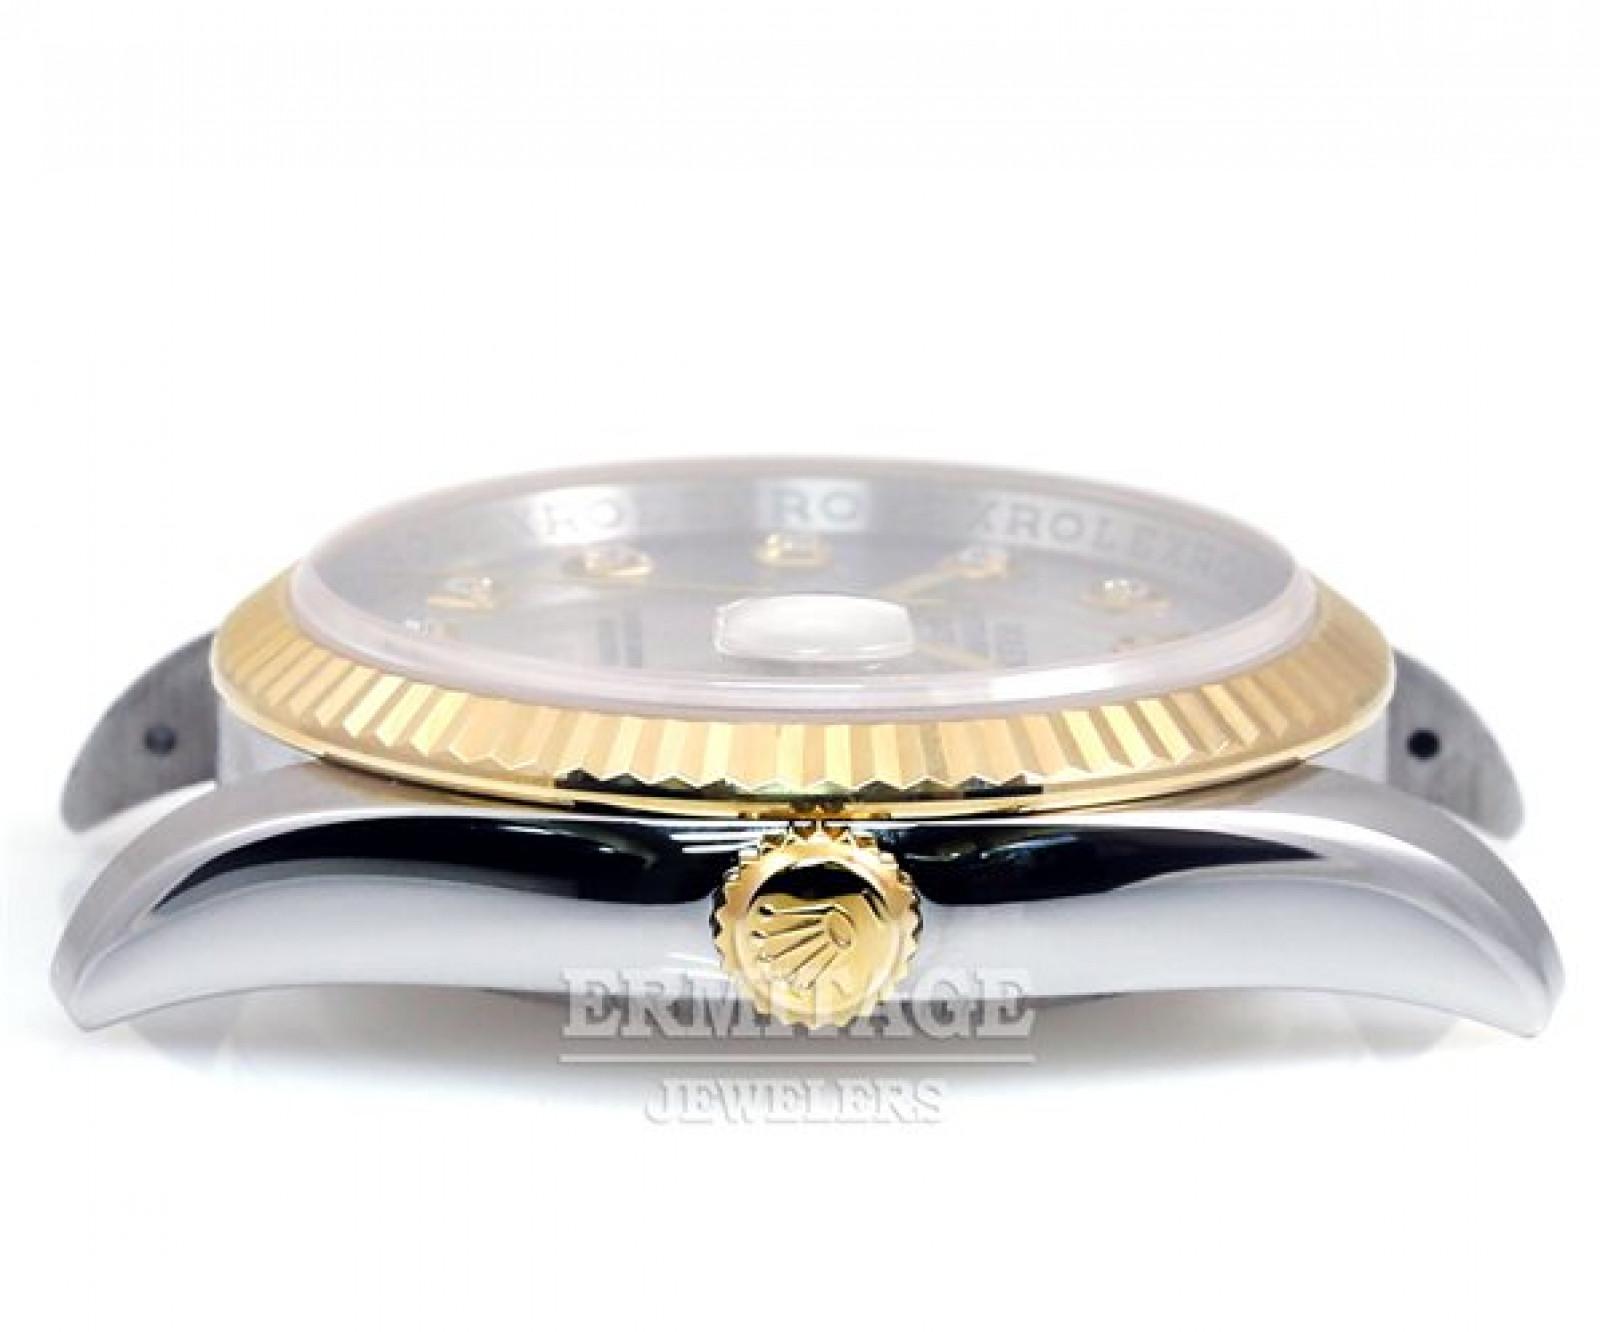 Silver Diamond Dial Rolex Datejust 116233